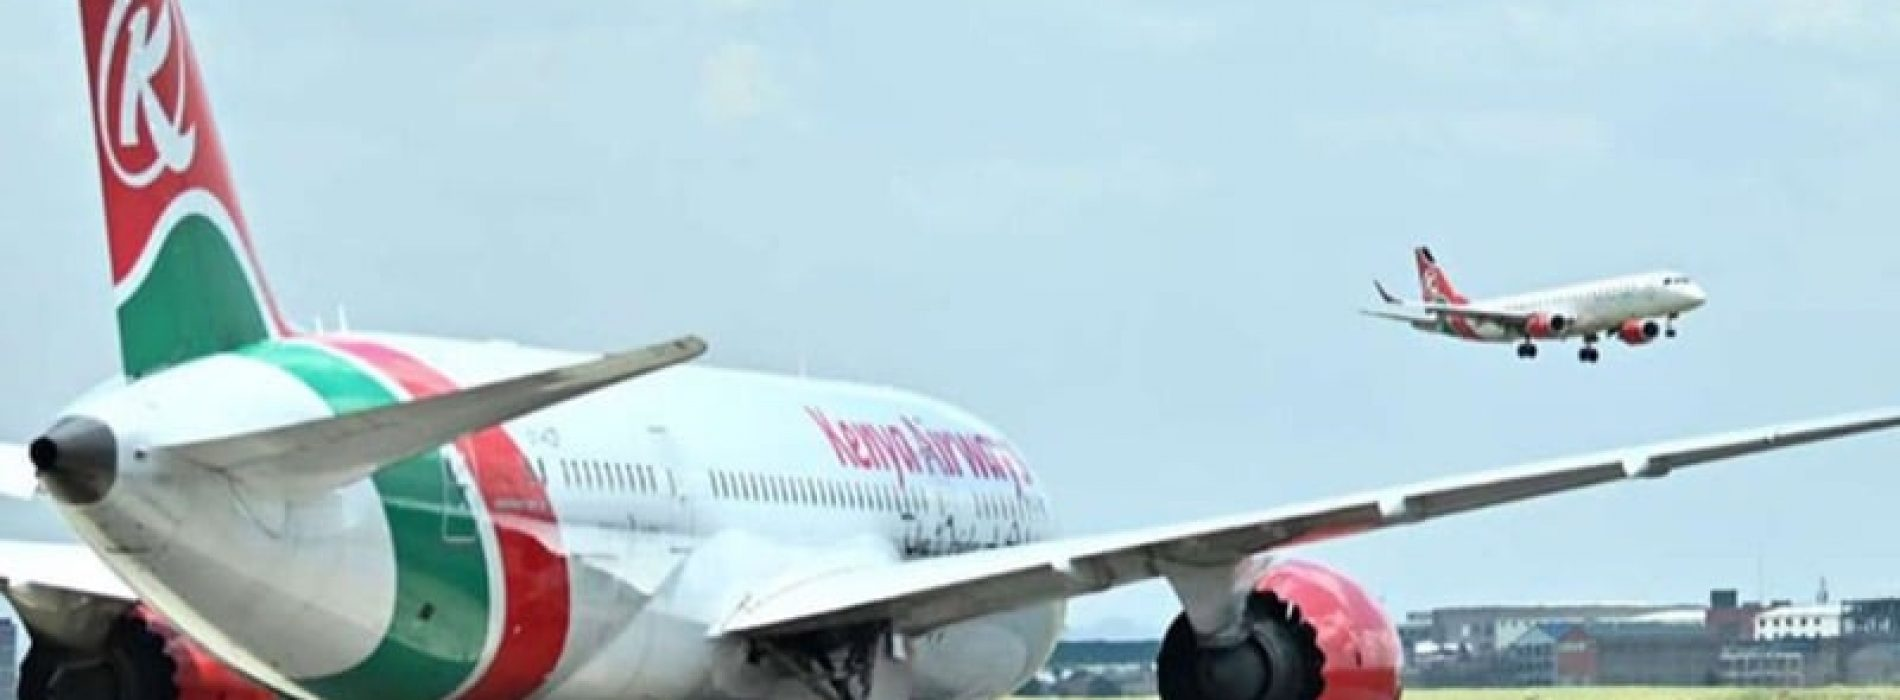 Kenya Airways riprende i voli per Roma a giugno